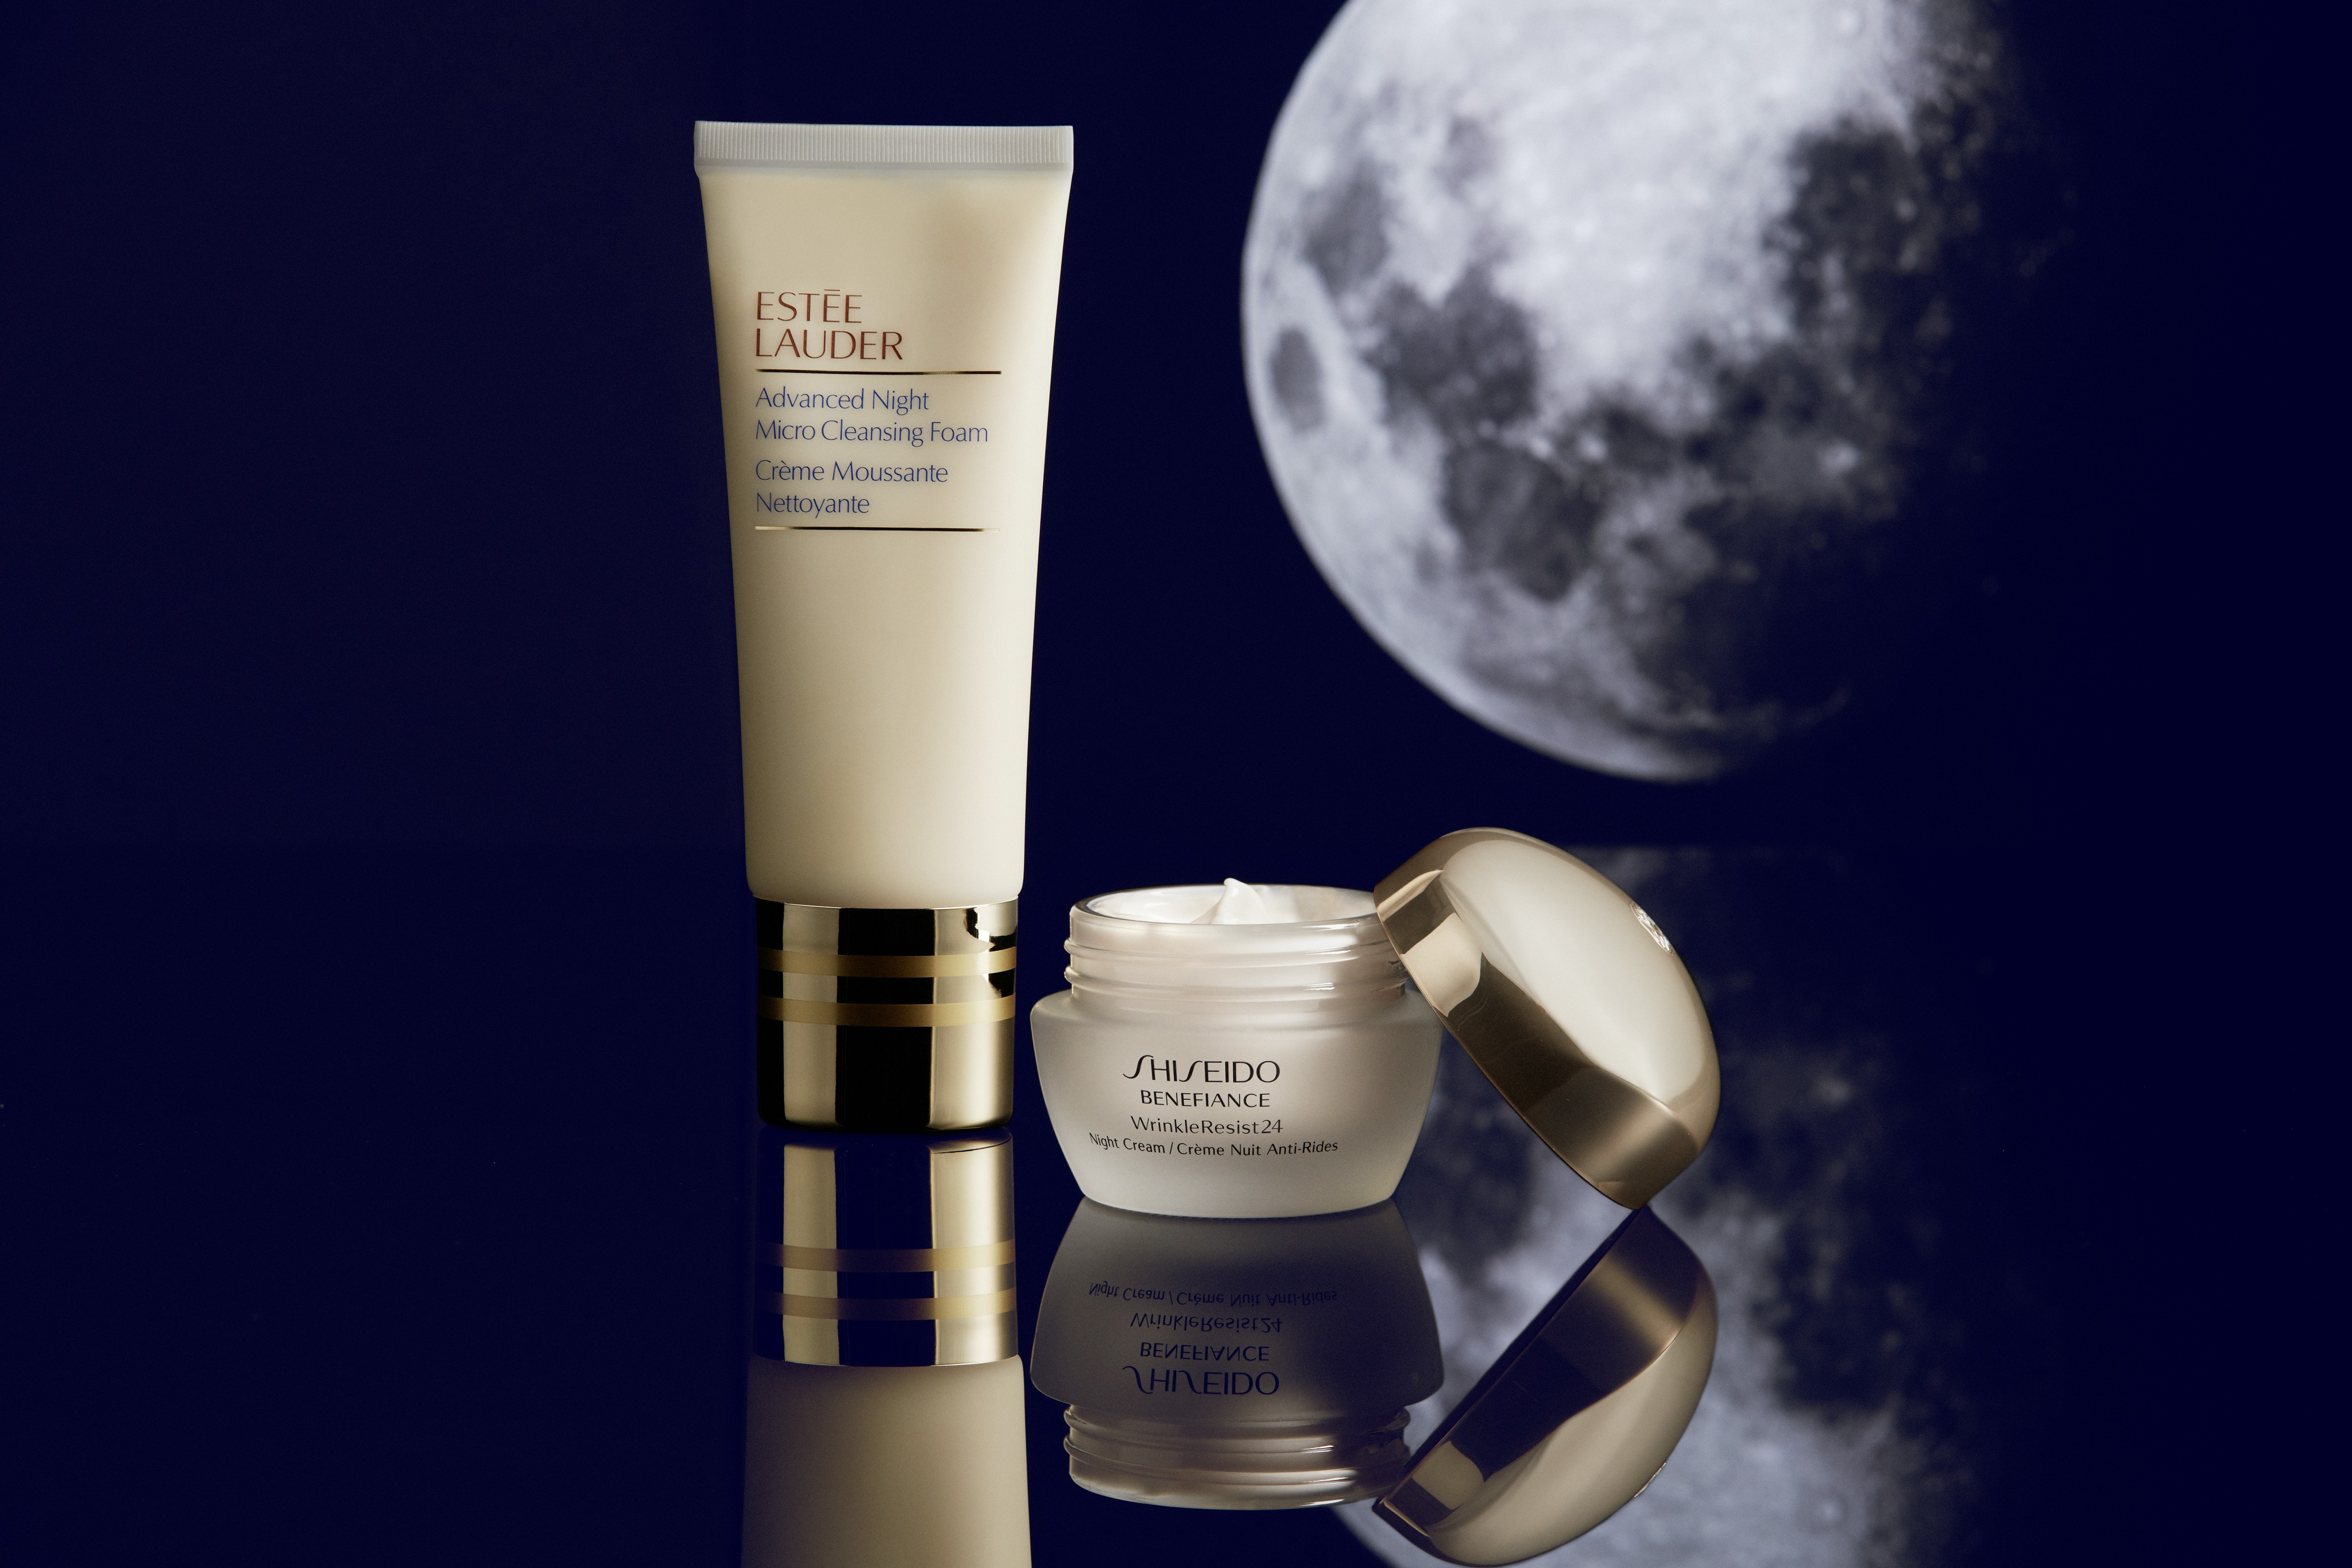 Skincare-product-beauty-sleep-cloud-heaven-moon-night-2-unlimited-Web-Rendition